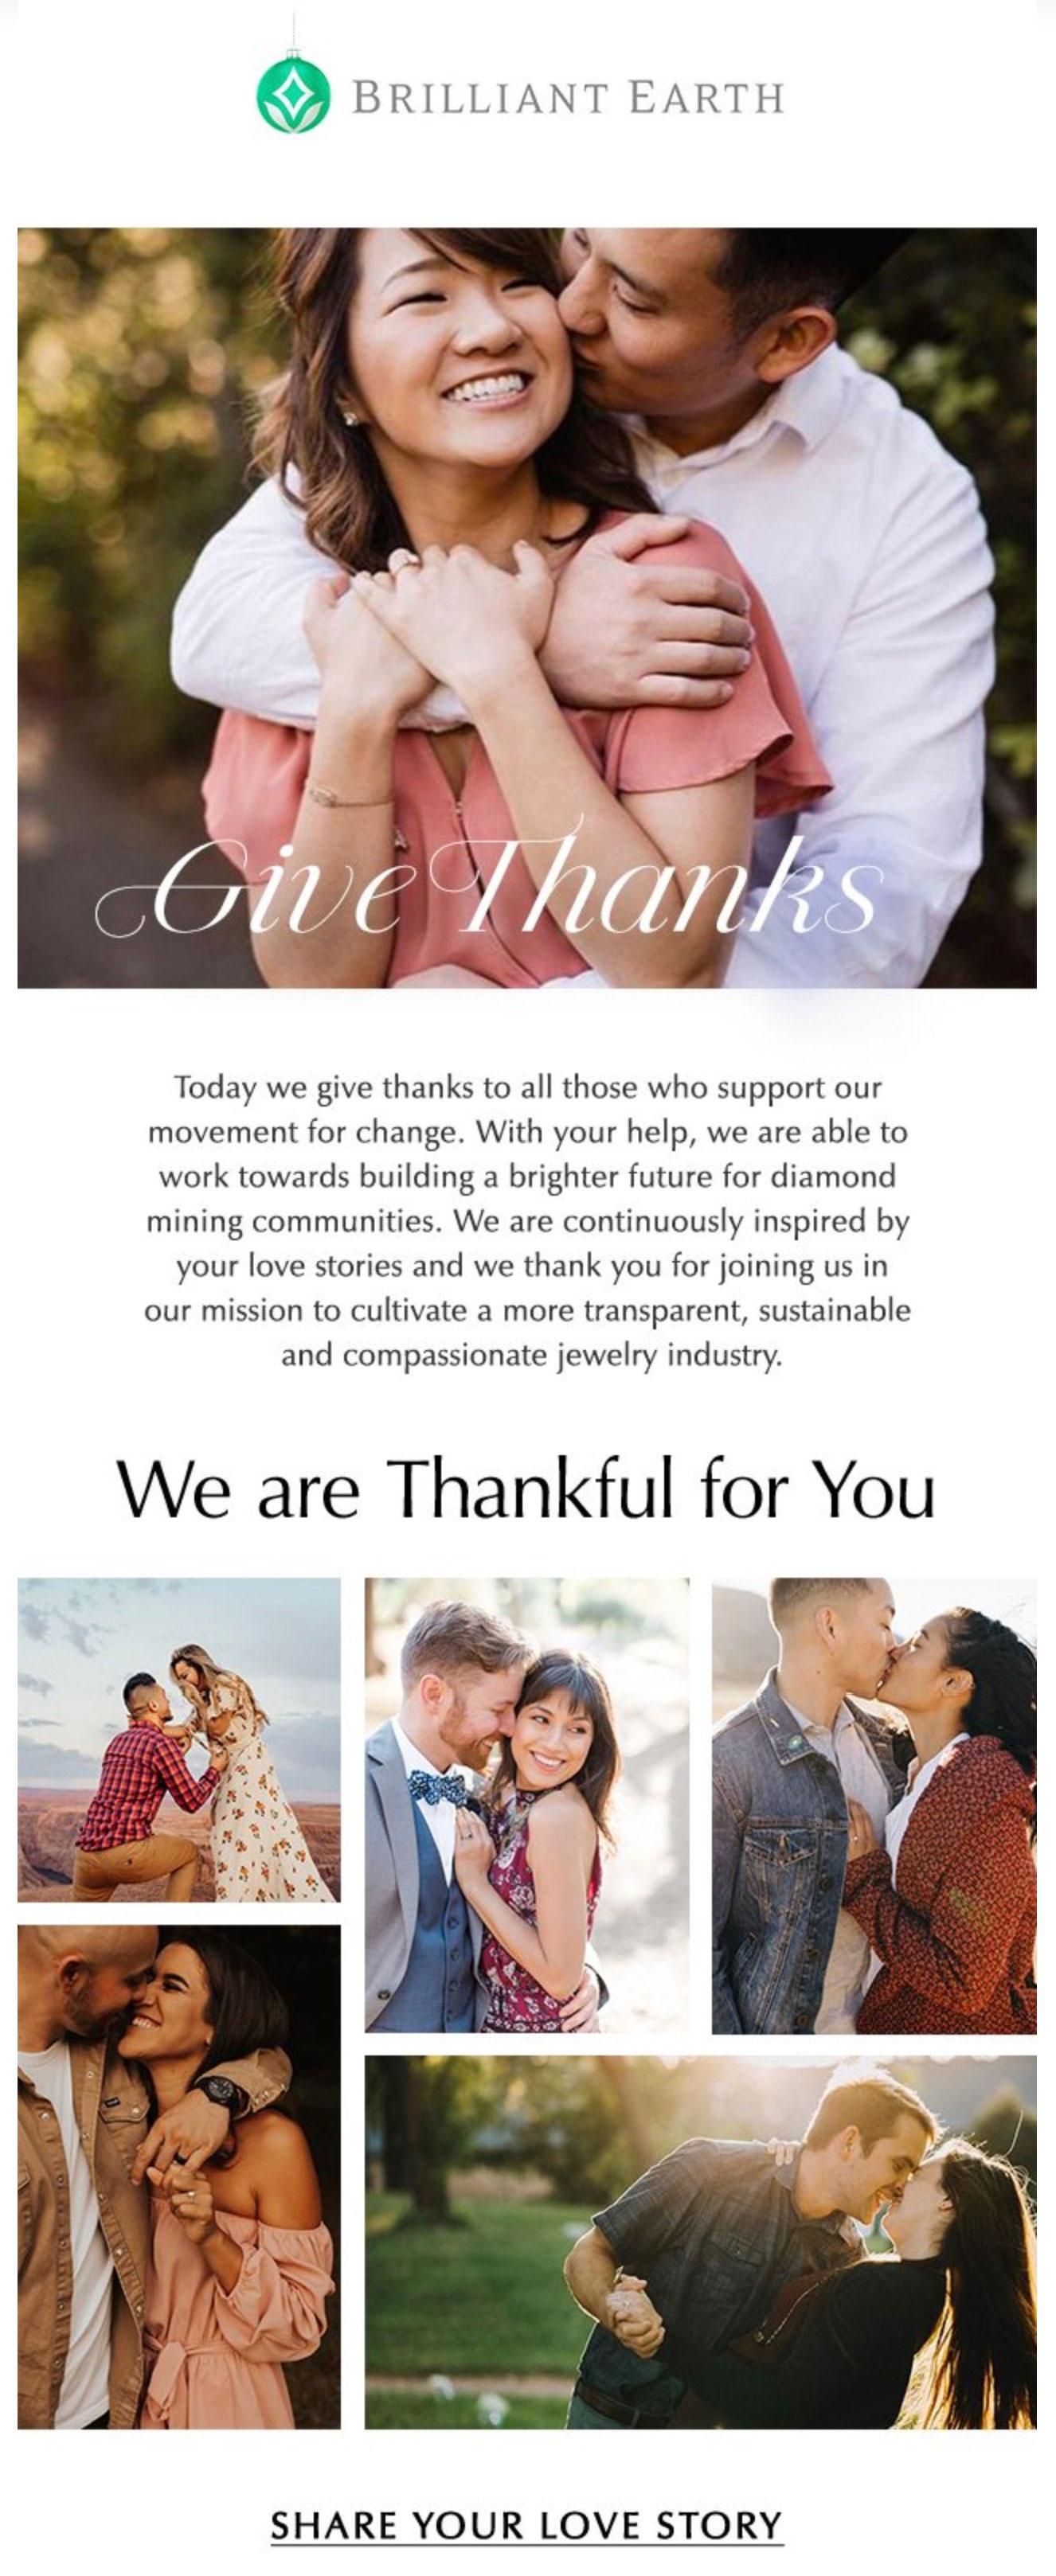 Brilliant Earth's thankful message.